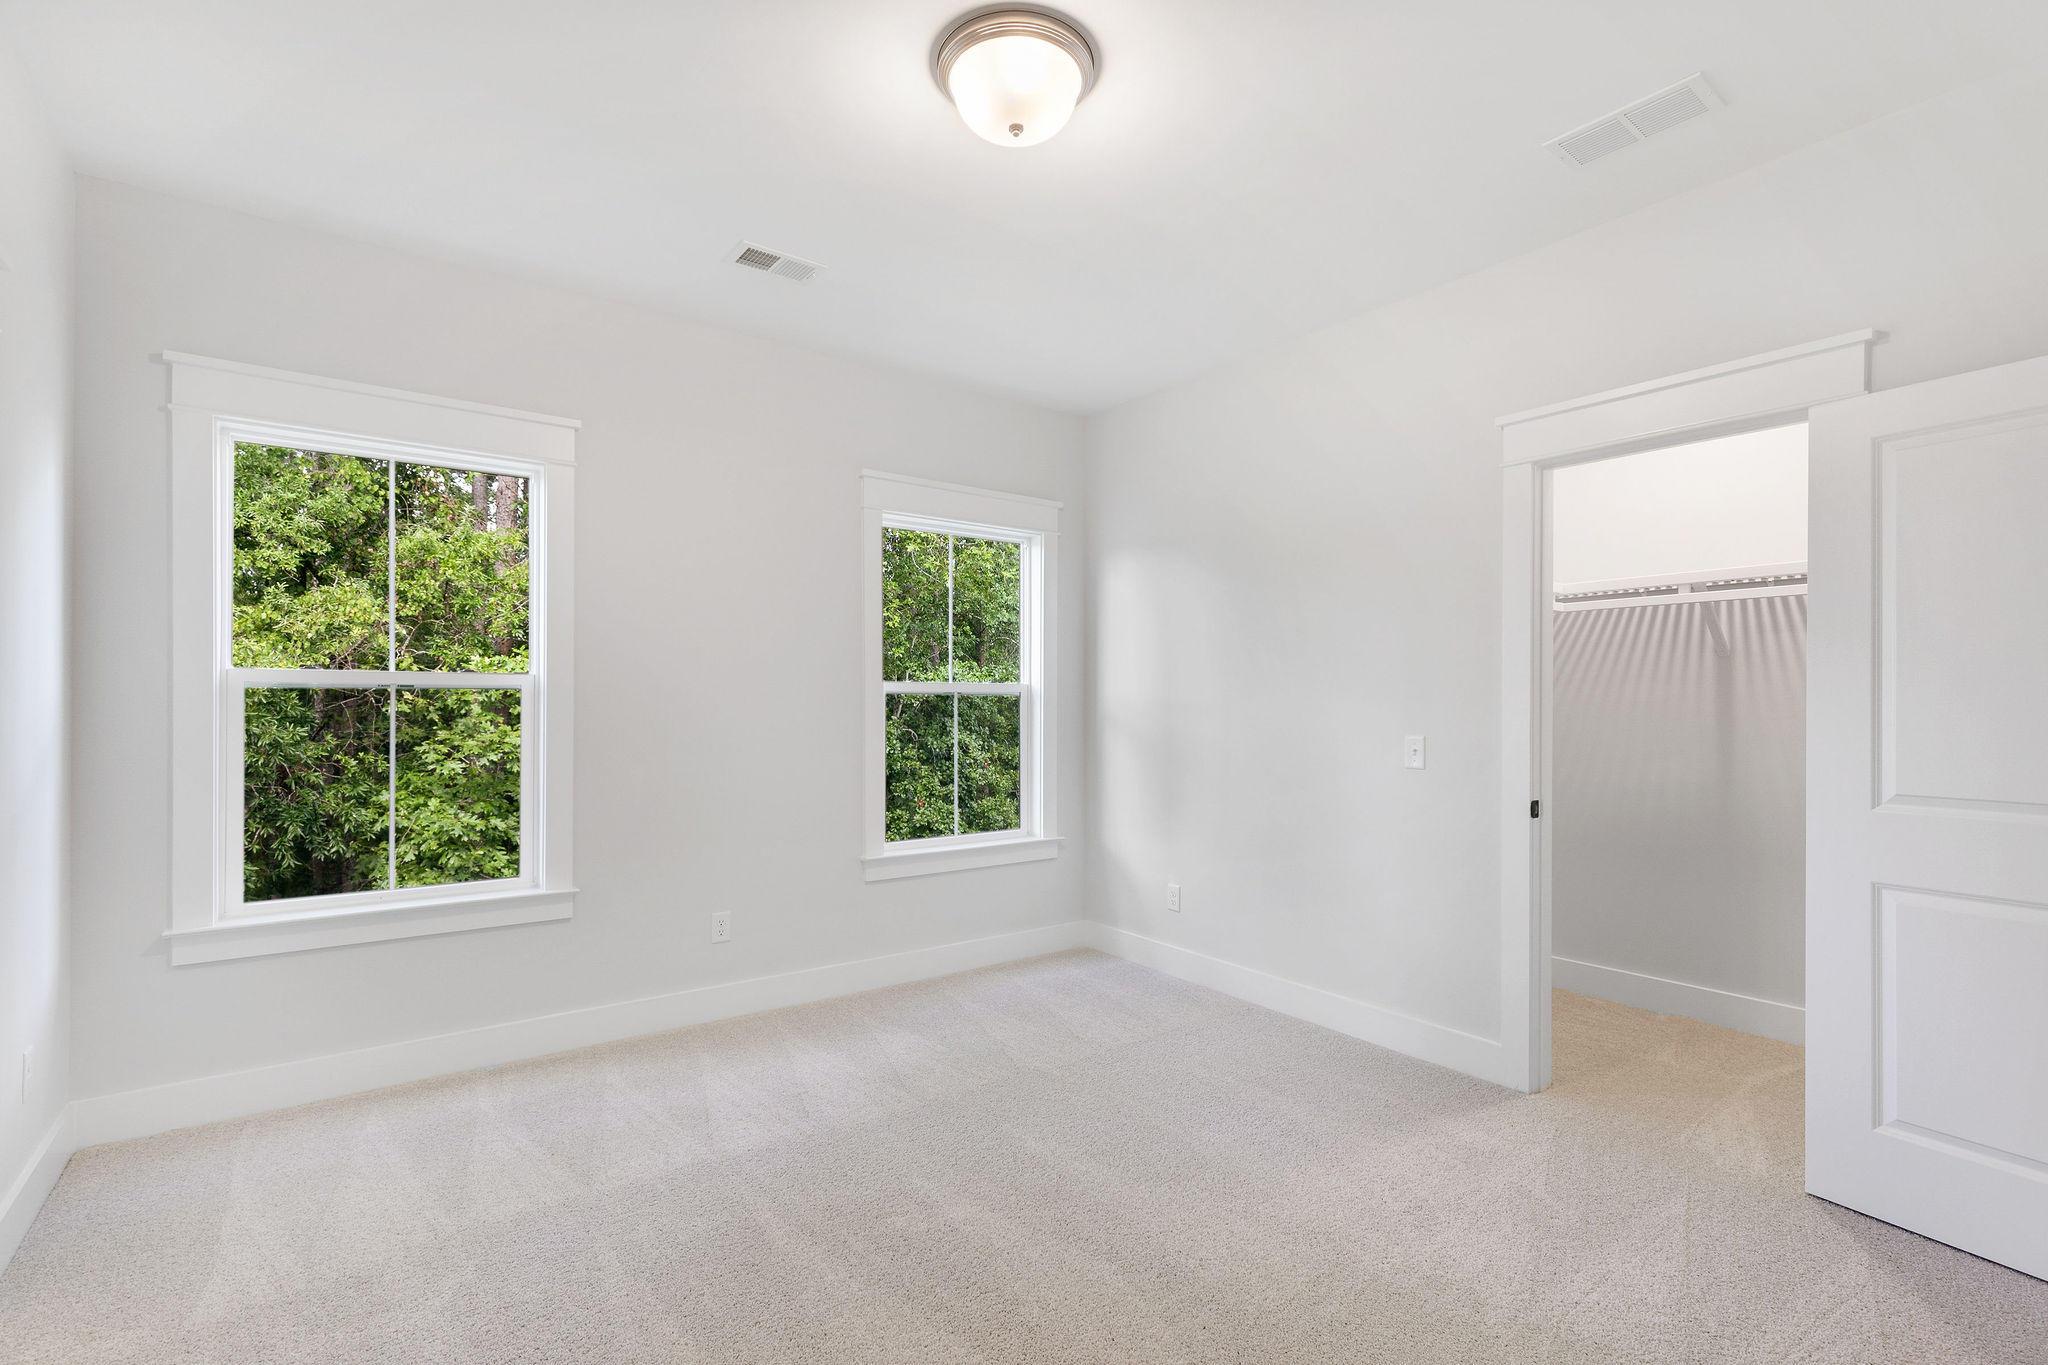 Park West Homes For Sale - 2291 Middlesex, Mount Pleasant, SC - 26